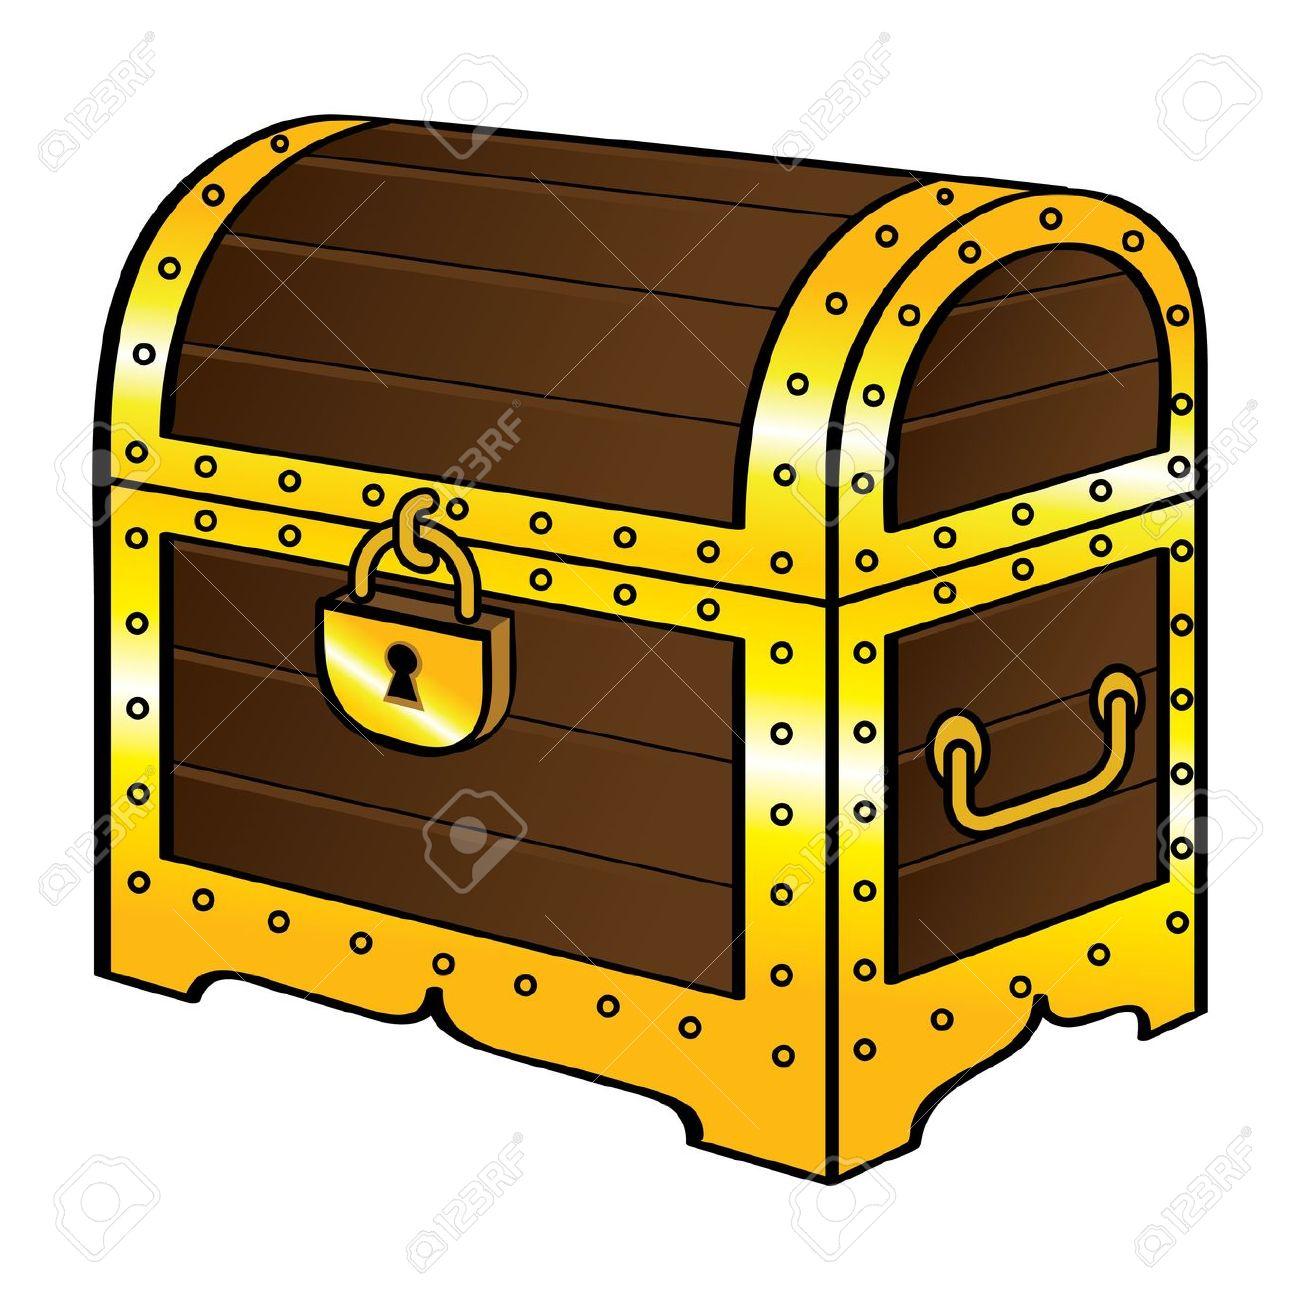 Free To Use Treasure Chest Clip art of Treasure Chest Clipart.